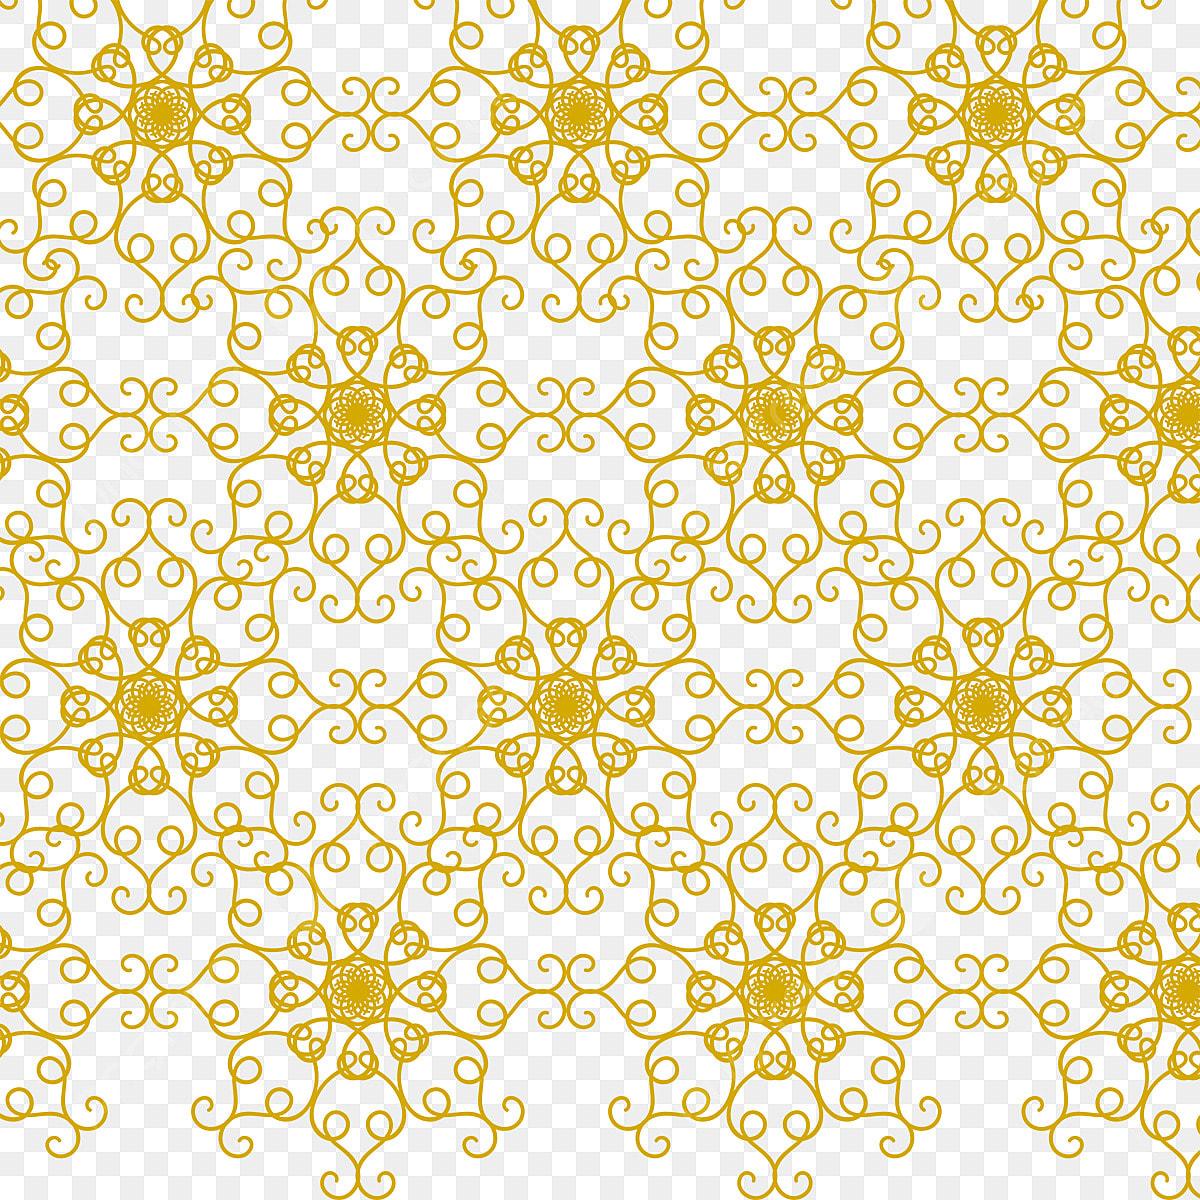 pngtree beautiful yellow pattern wallpaper background png image 3696297